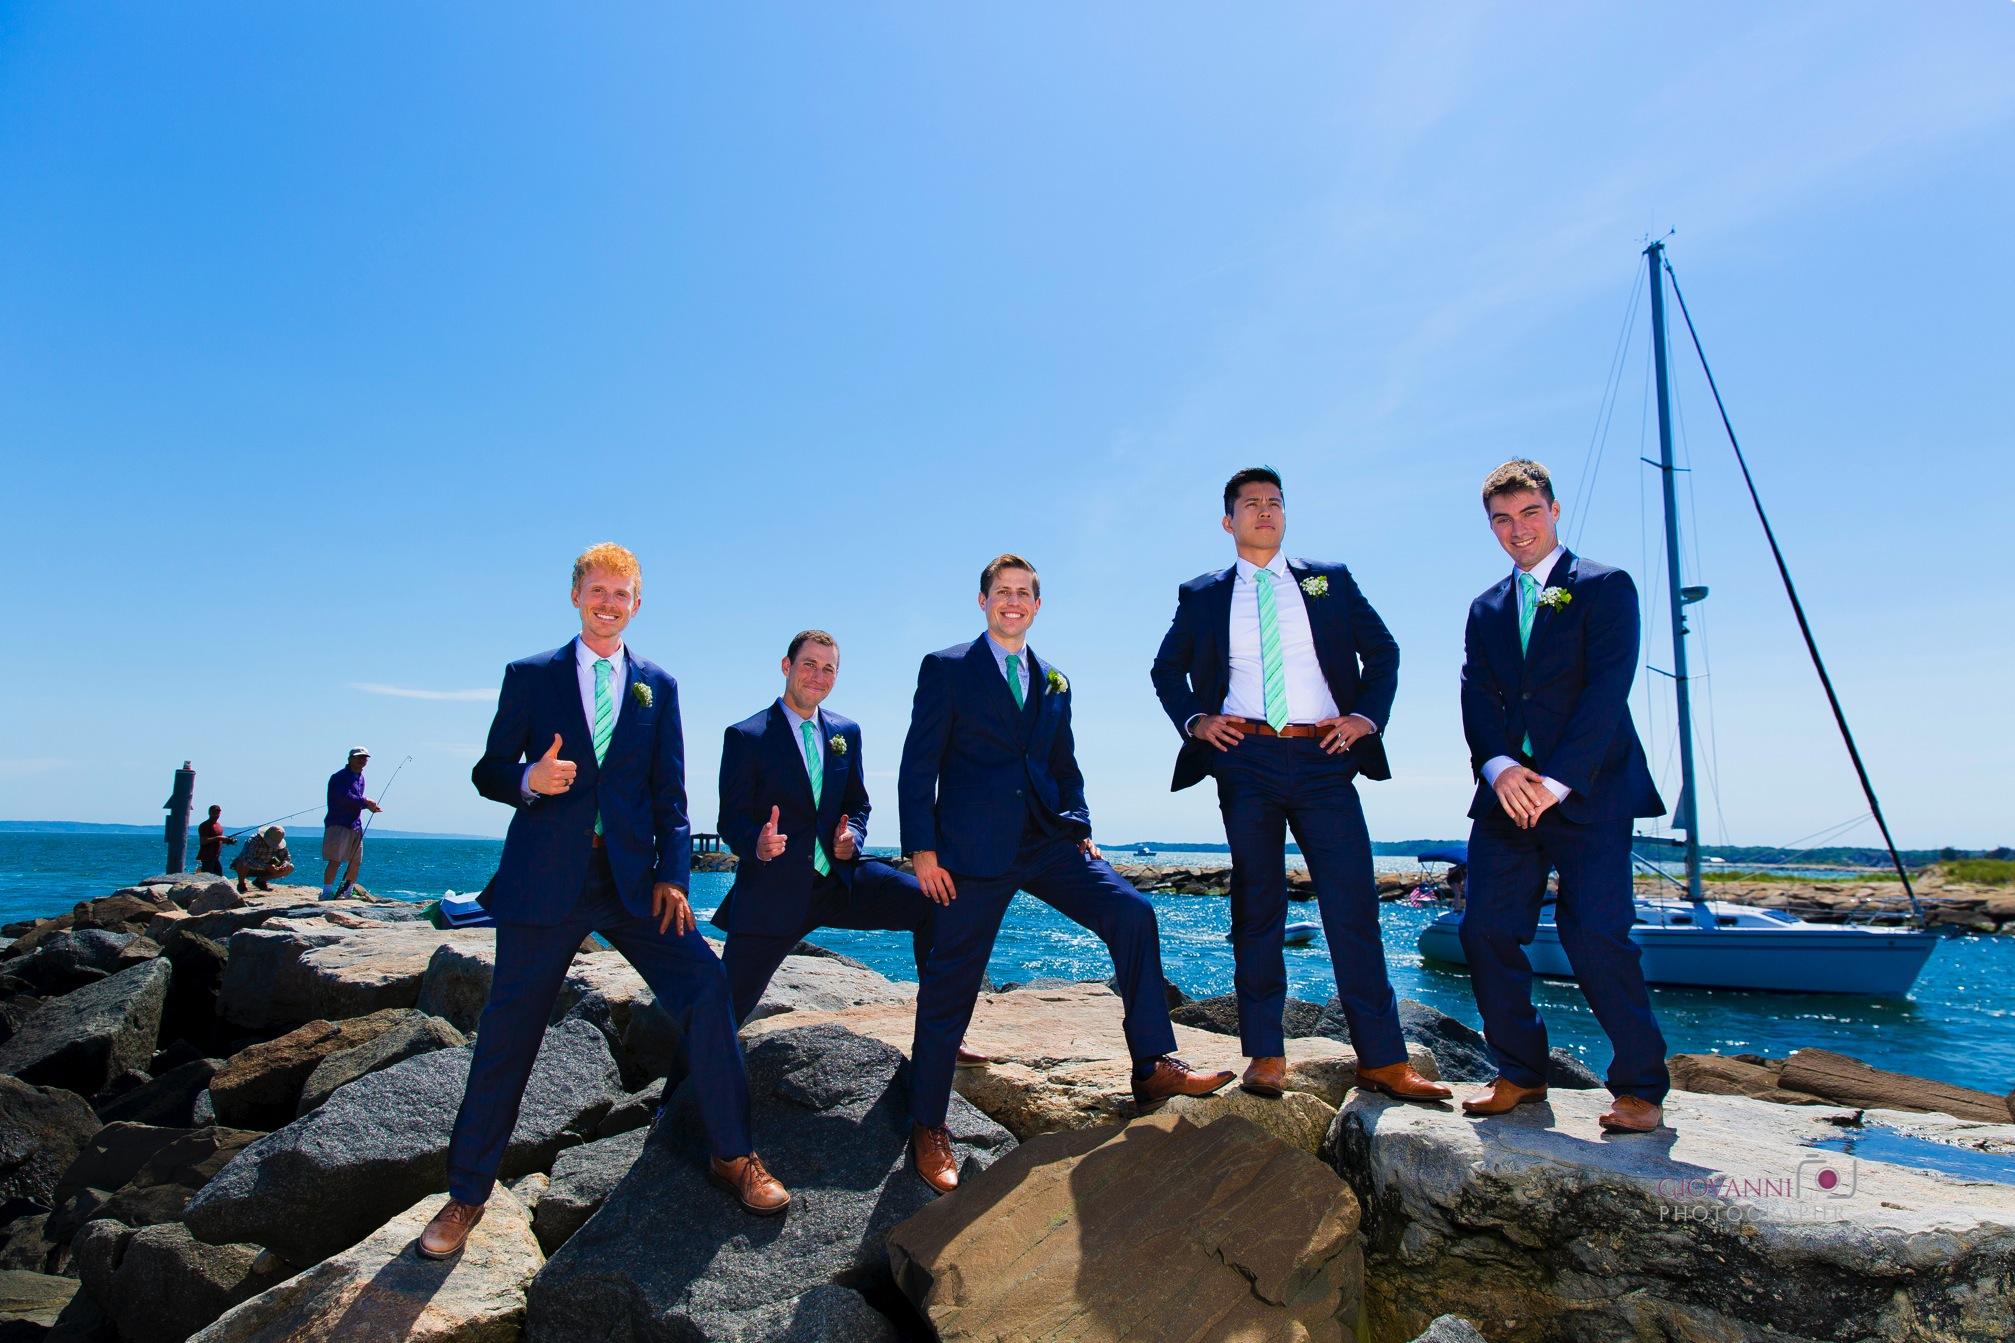 314A0648 Giovanni The Photographer-Boston Wedding Photography  Falmouth Yacht Club - Cape Cod - Meaghan and Tim WM 35.jpg